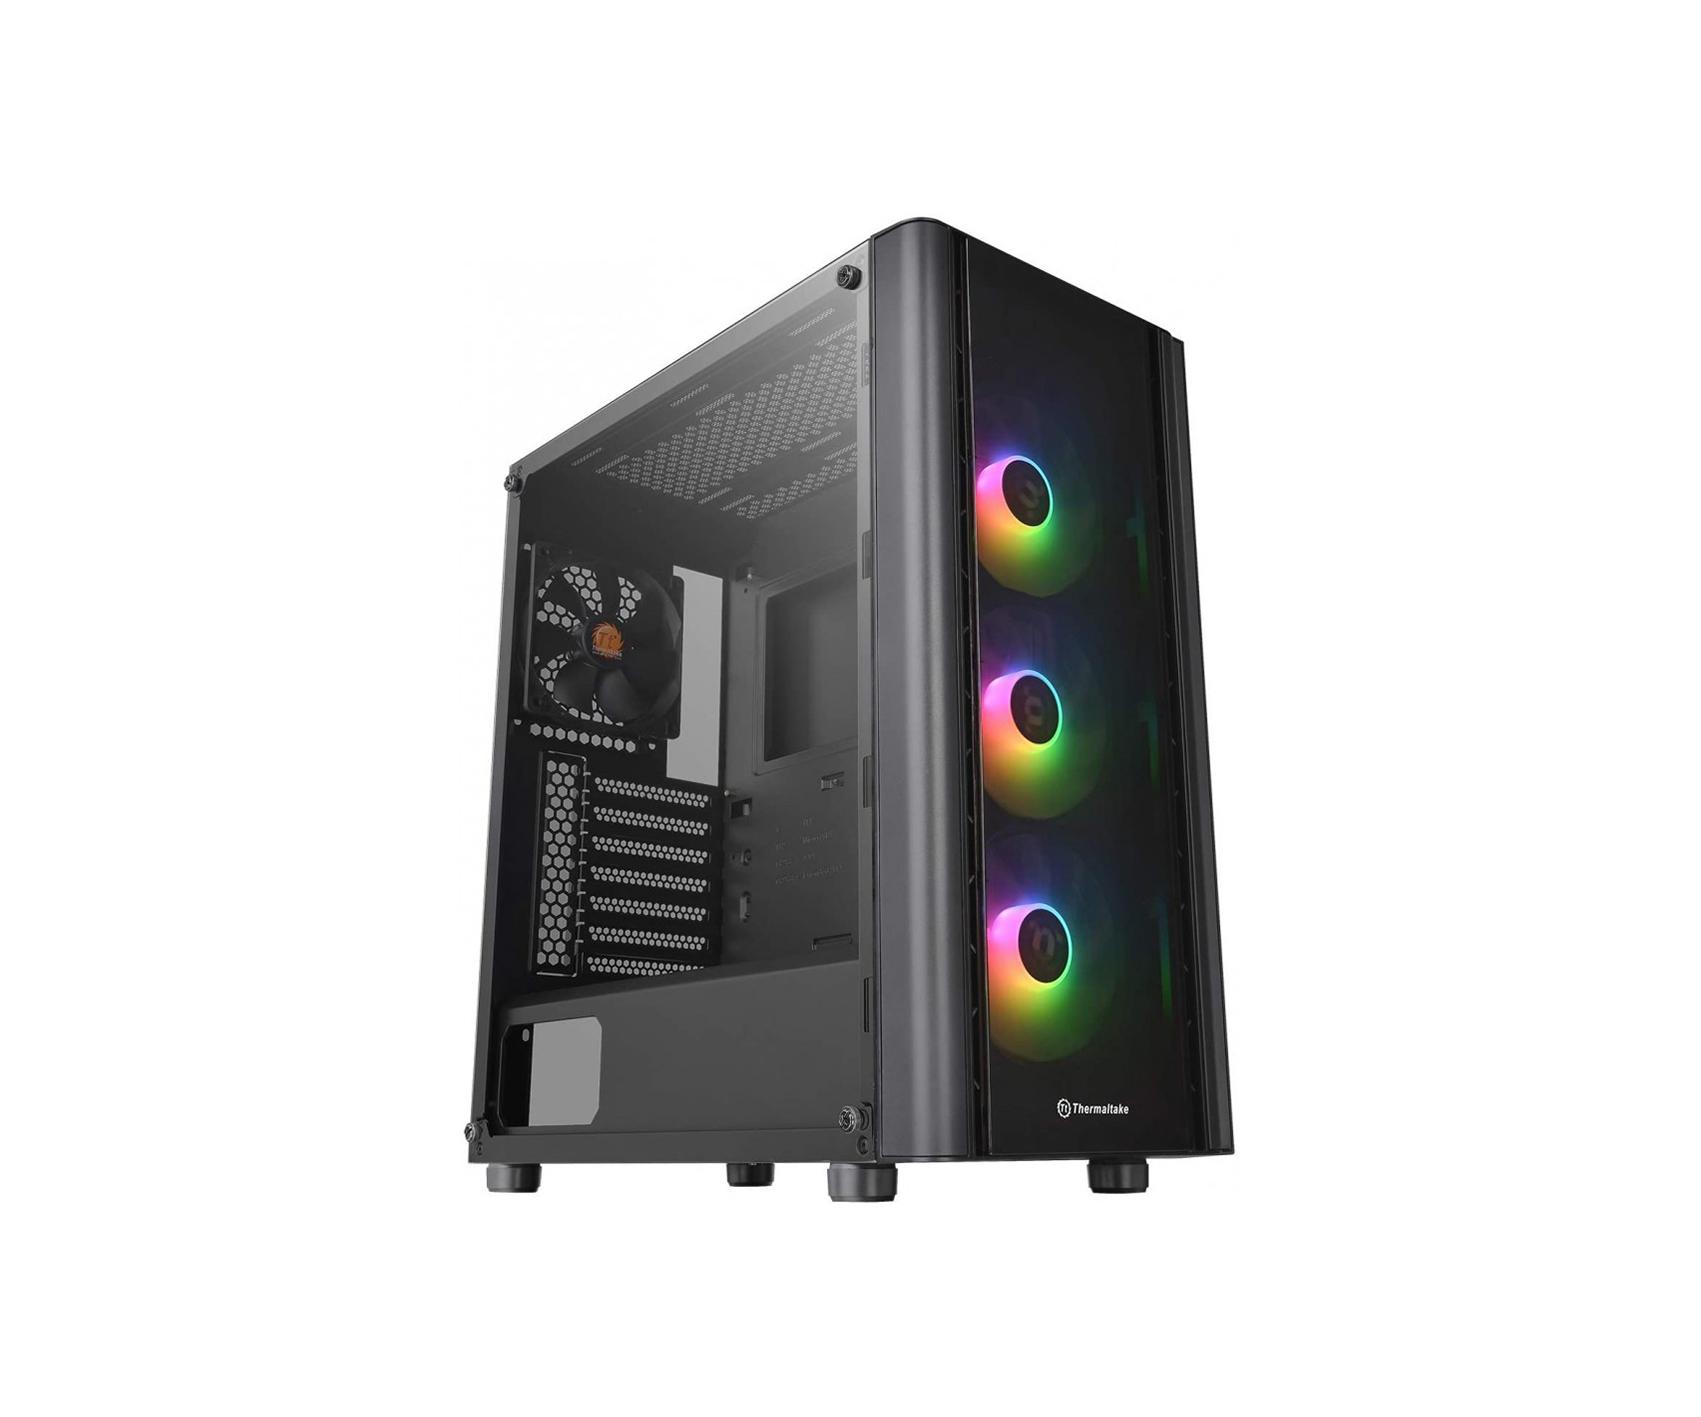 Case Thermaltake V250 TG ARGB Mid-Tower